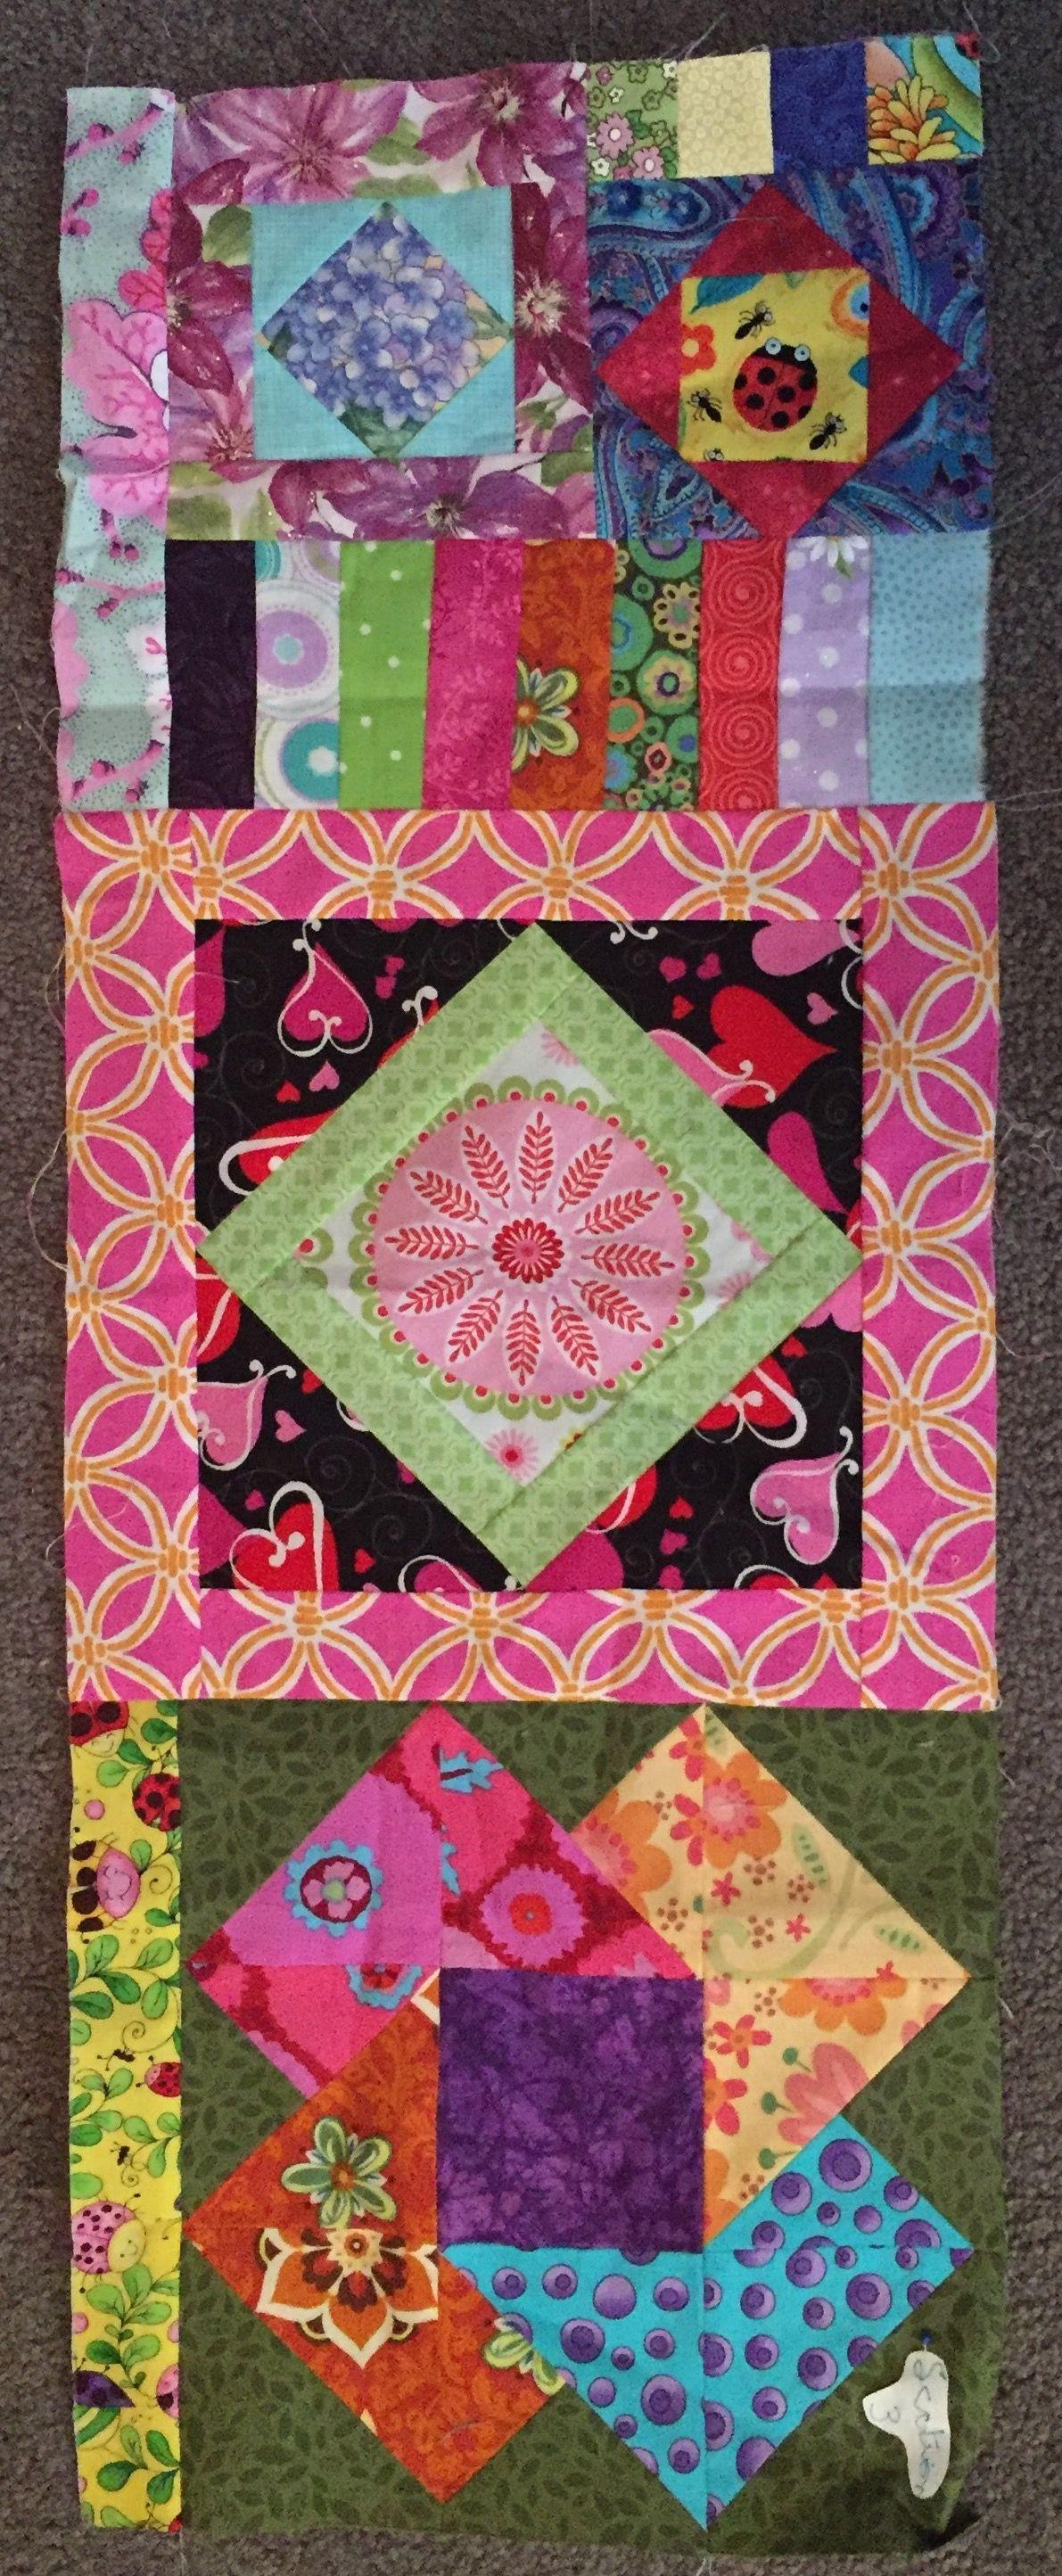 3 Fabric Quilt Patterns New Inspiration Design